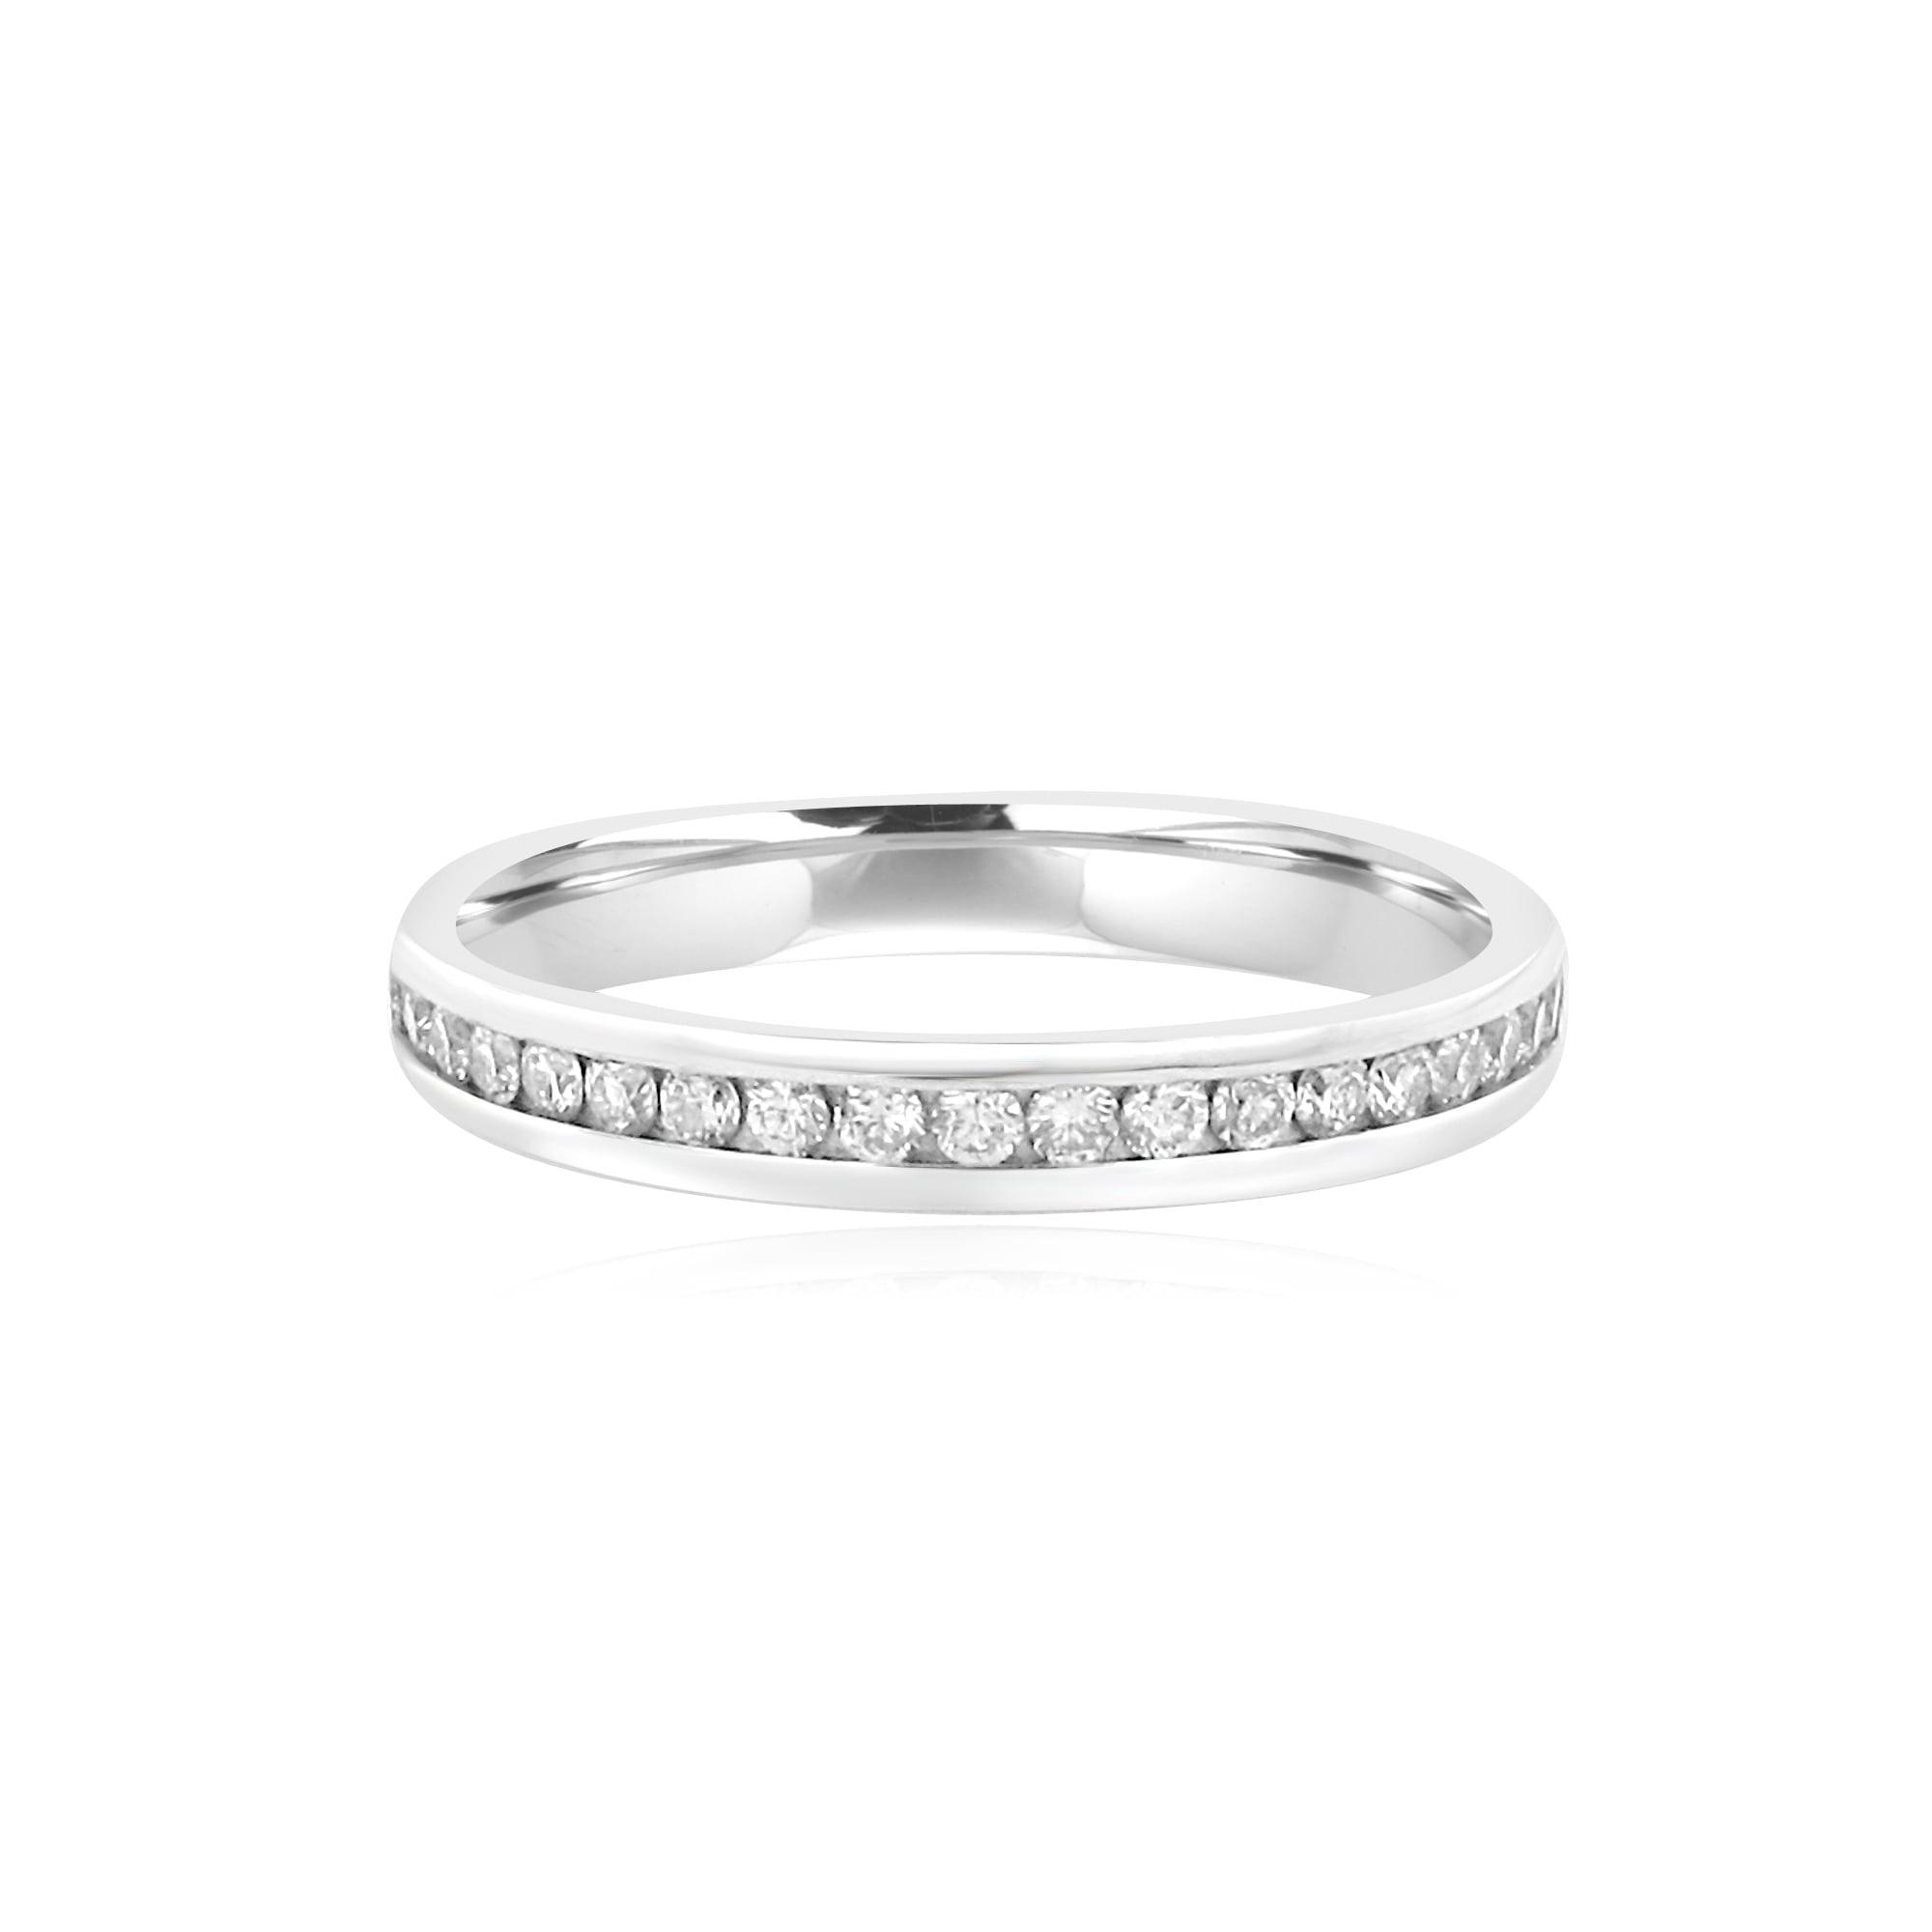 3mm Wide 024ct Round Diamond 18ct White Gold Wedding Ring Womens